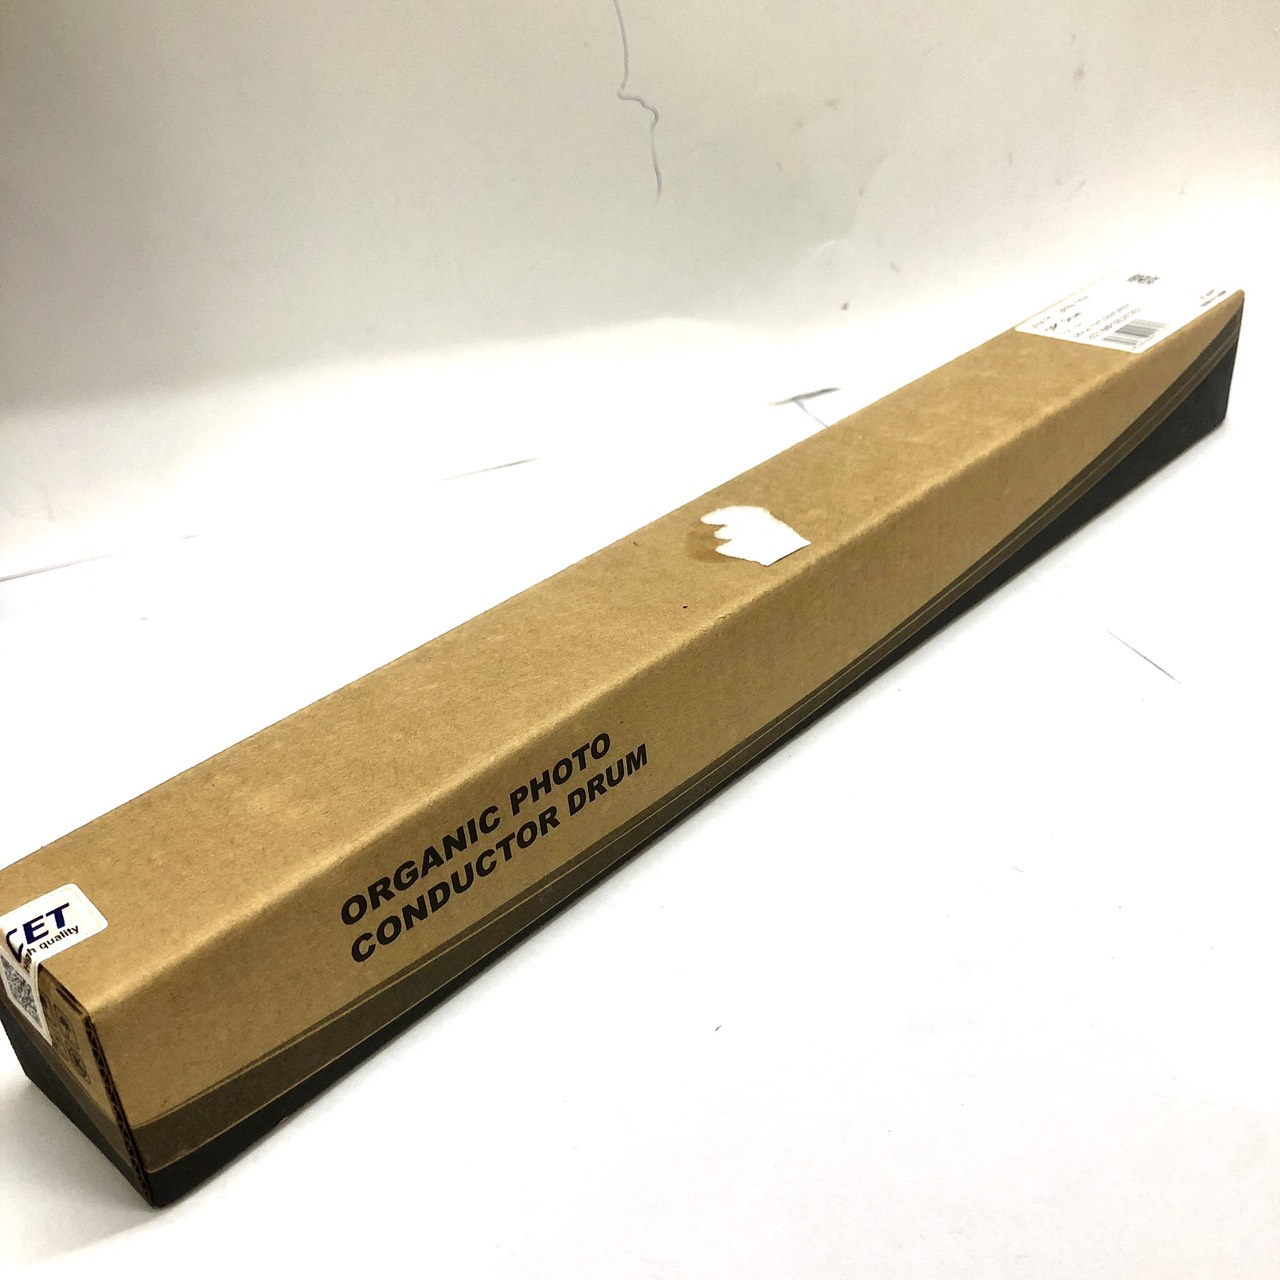 Trống (Drum) dùng cho máy photocopy Ricoh 1500, 1600, 1800, 1900, 2000 Le, 2000 L2, 2001, 2501